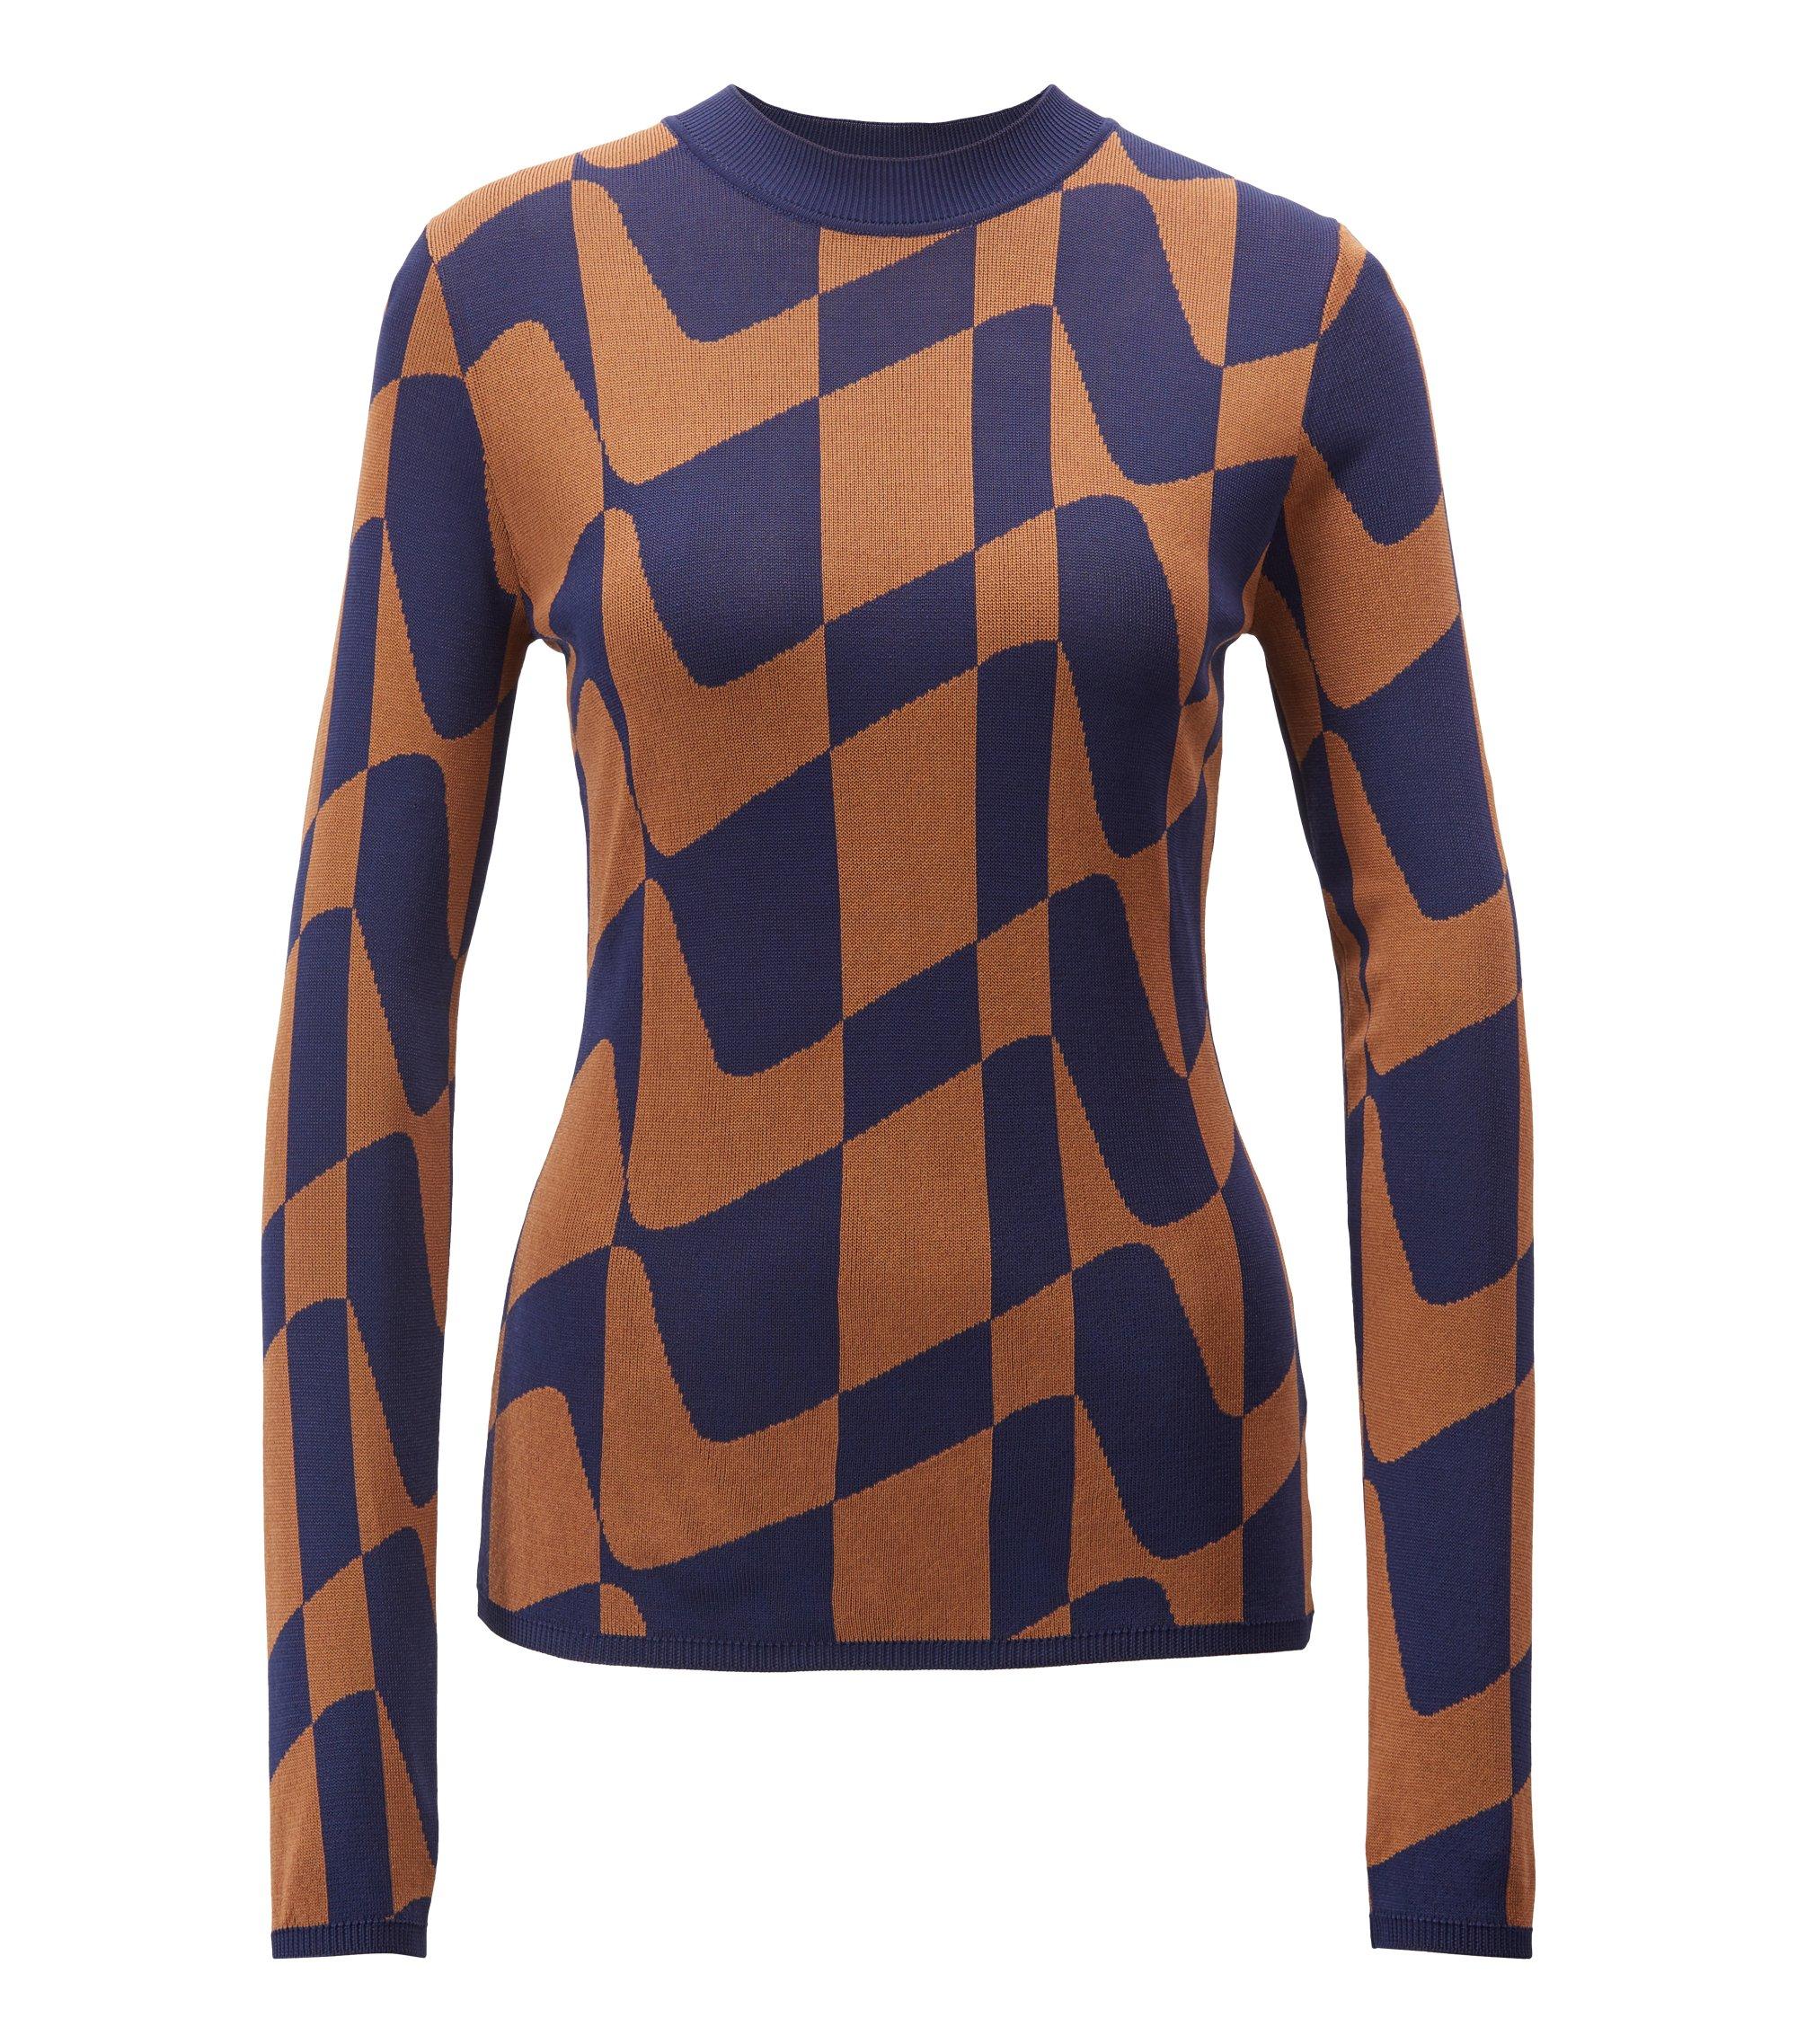 Slim-fit sweater in abstract Italian jacquard, Gemustert